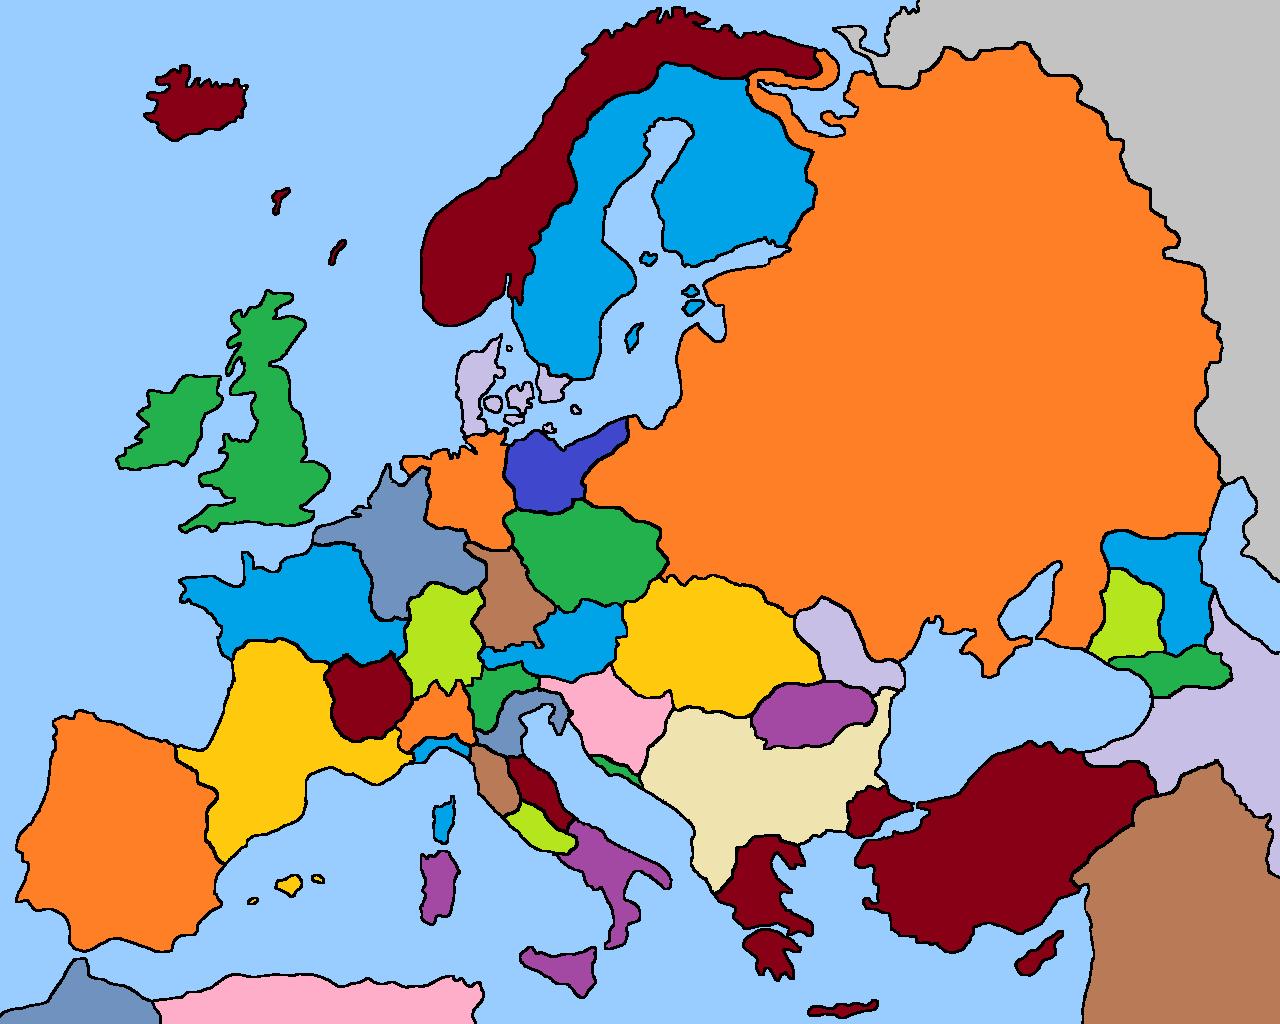 image europe 1800 fidem pacis alternative history